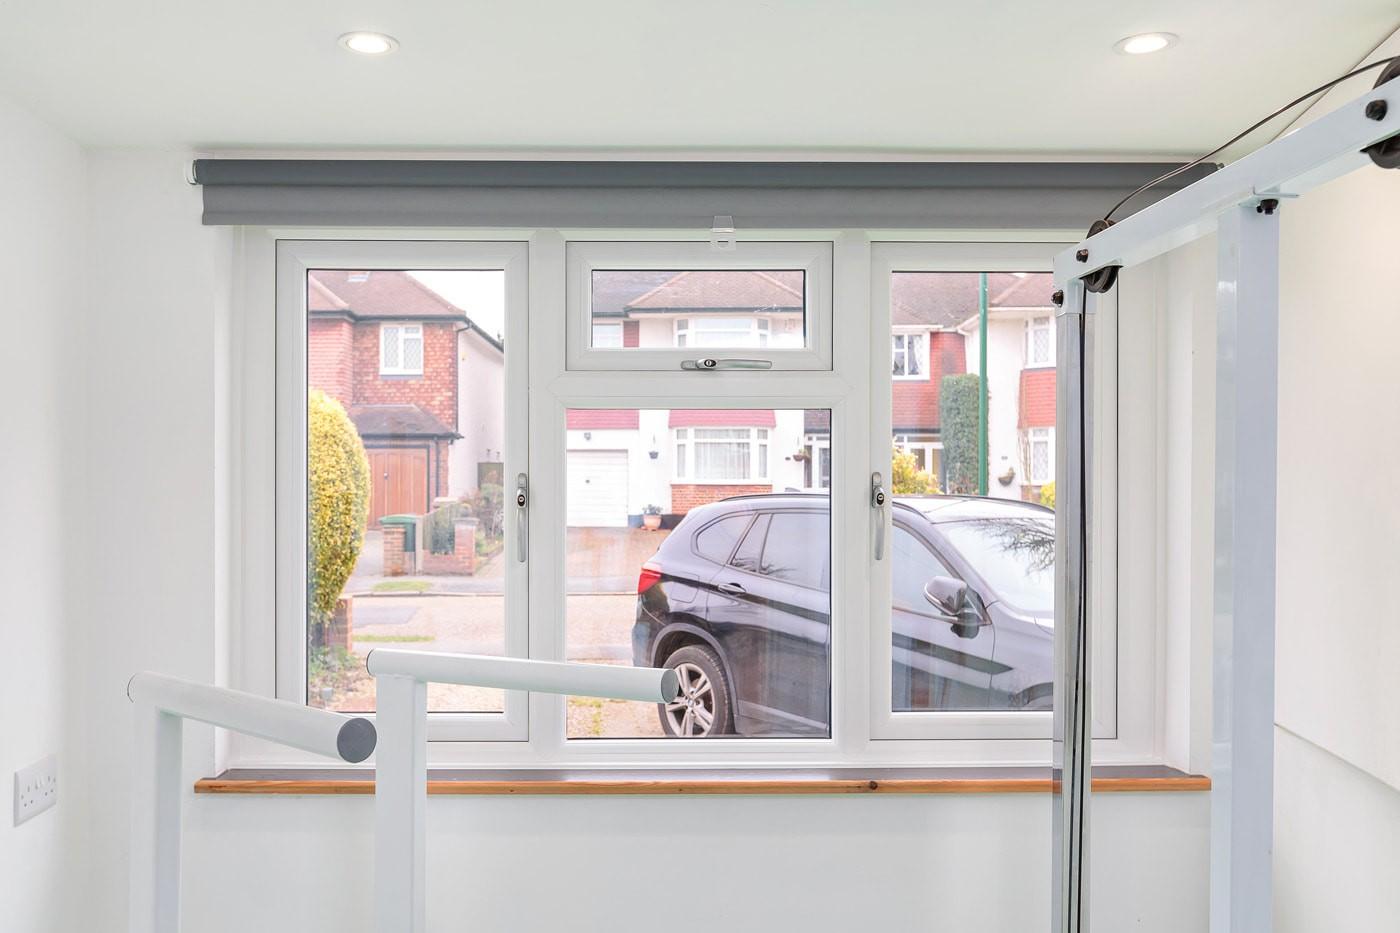 Whole house replacement windows Wallington